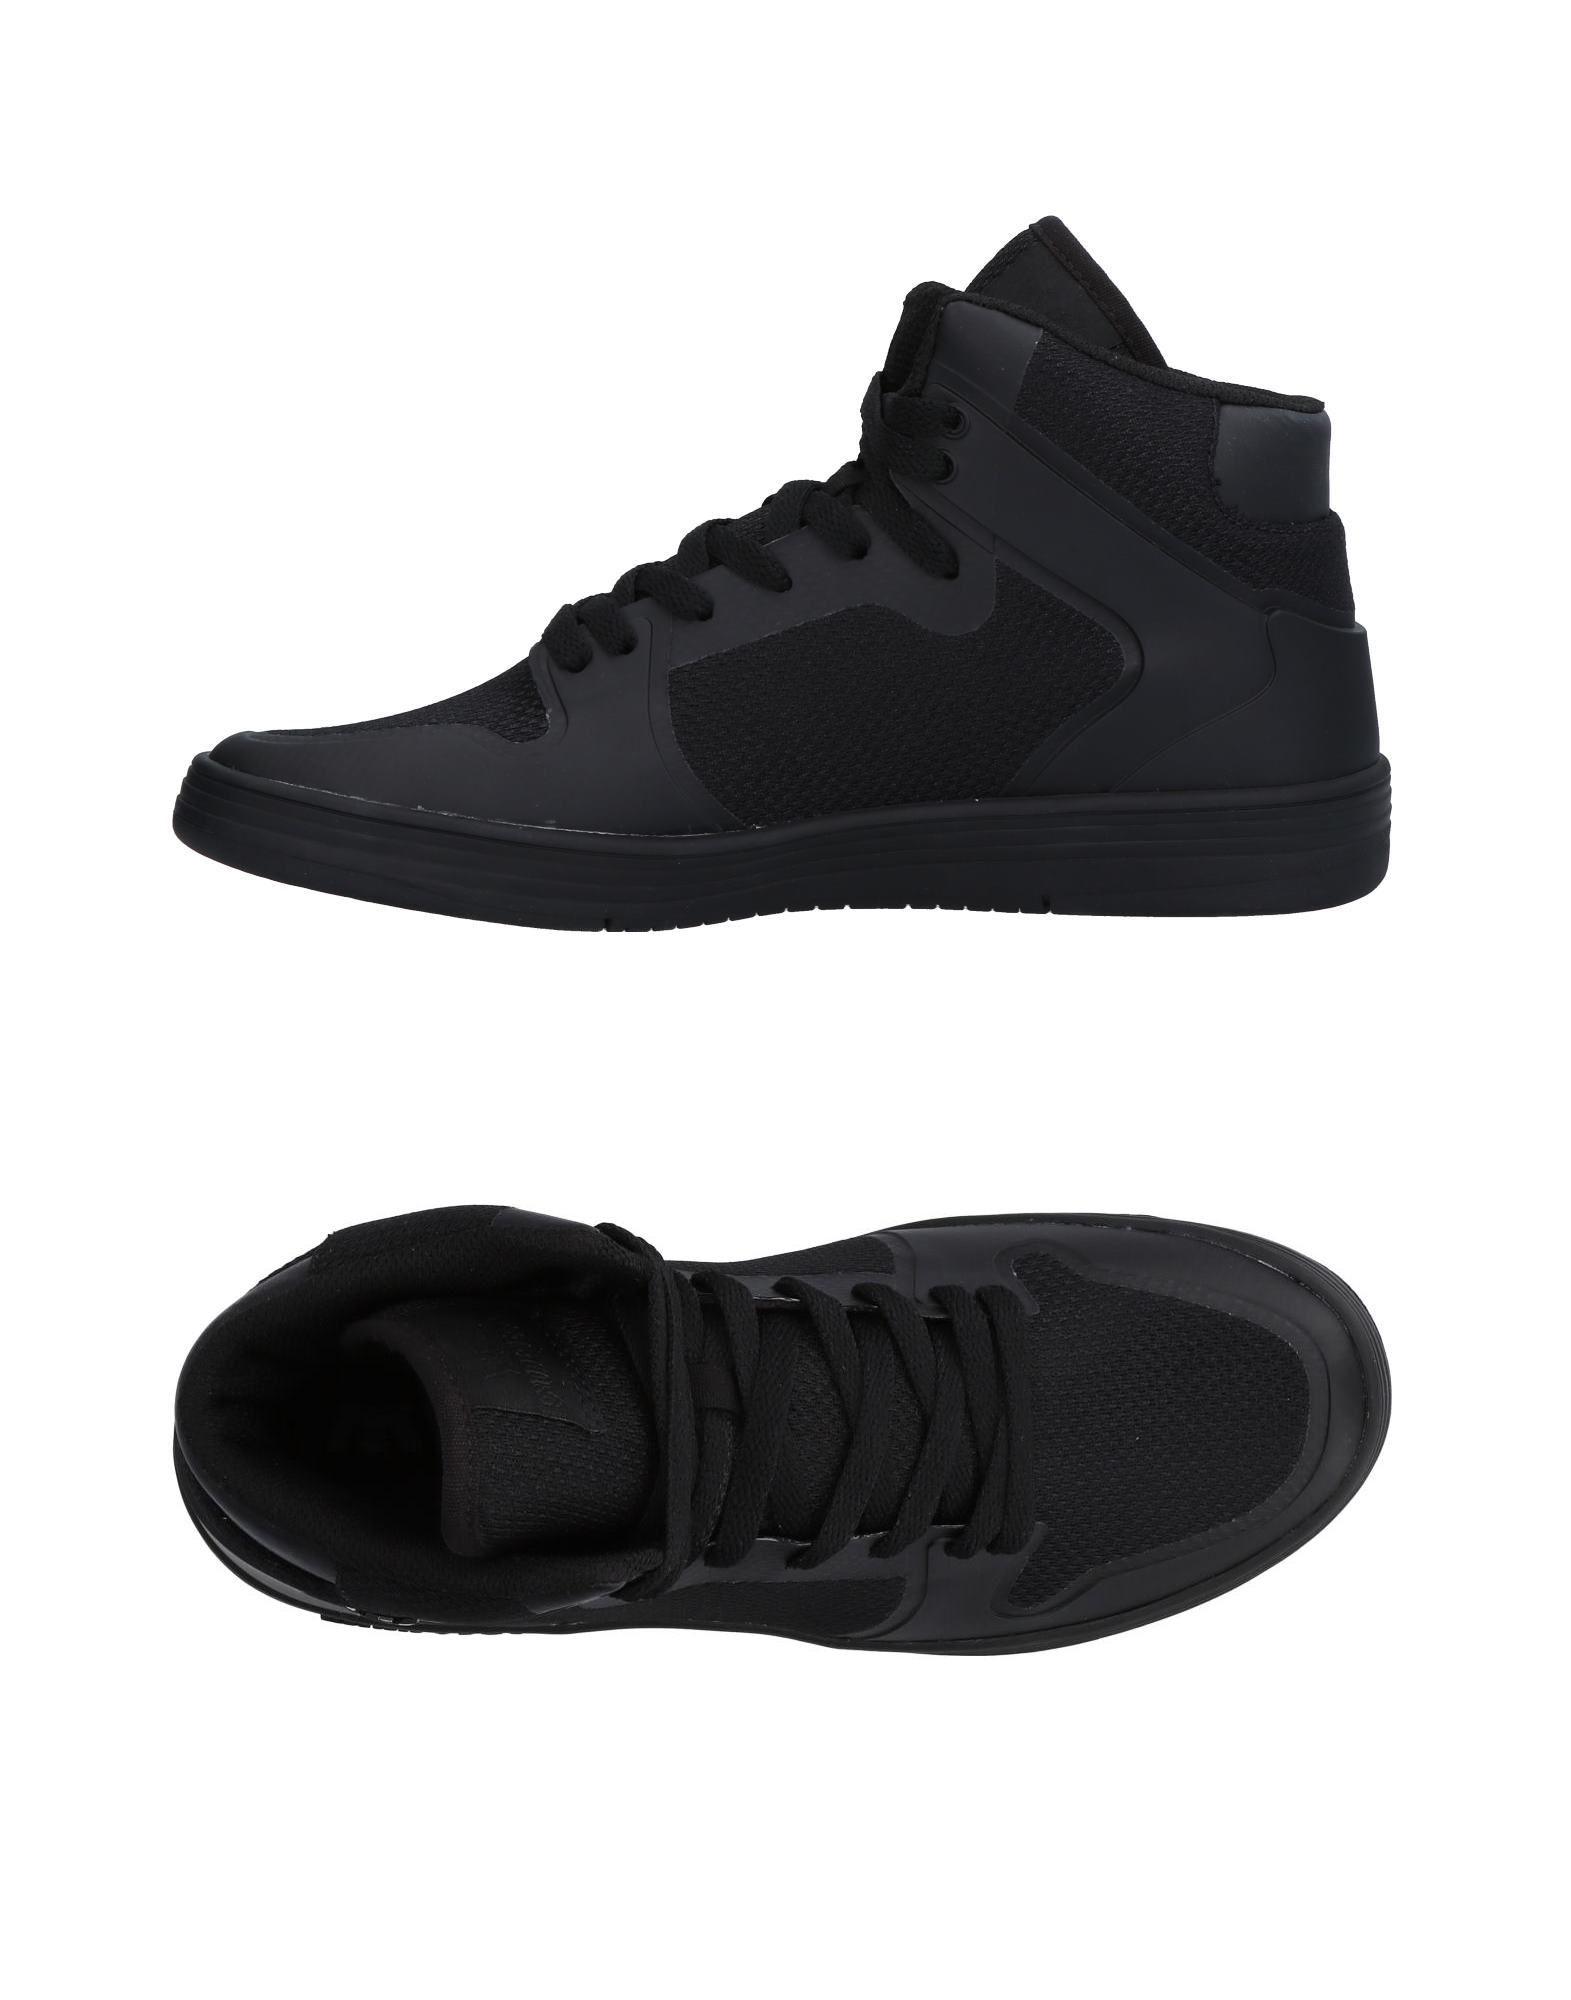 Supra Sneakers - Australia Men Supra Sneakers online on  Australia - - 11471932FR 9cc6c2